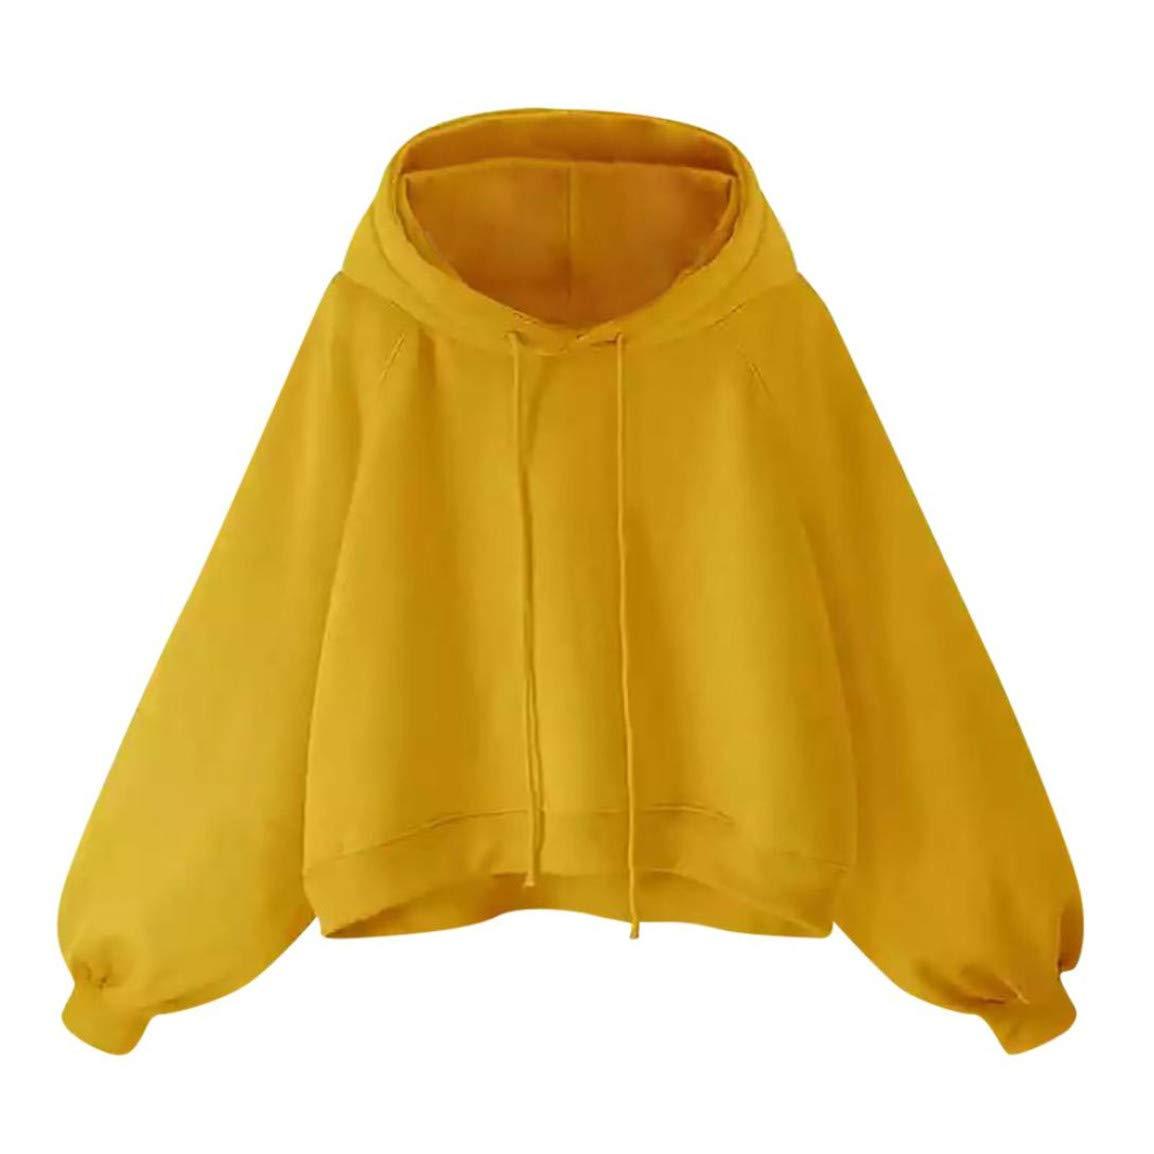 Moonuy Frauen Hoodie Damen Lantern Sleeve Sweater Damen Langarm Freizeit Lose dü nne Kapuzenbluse Warm Pullover